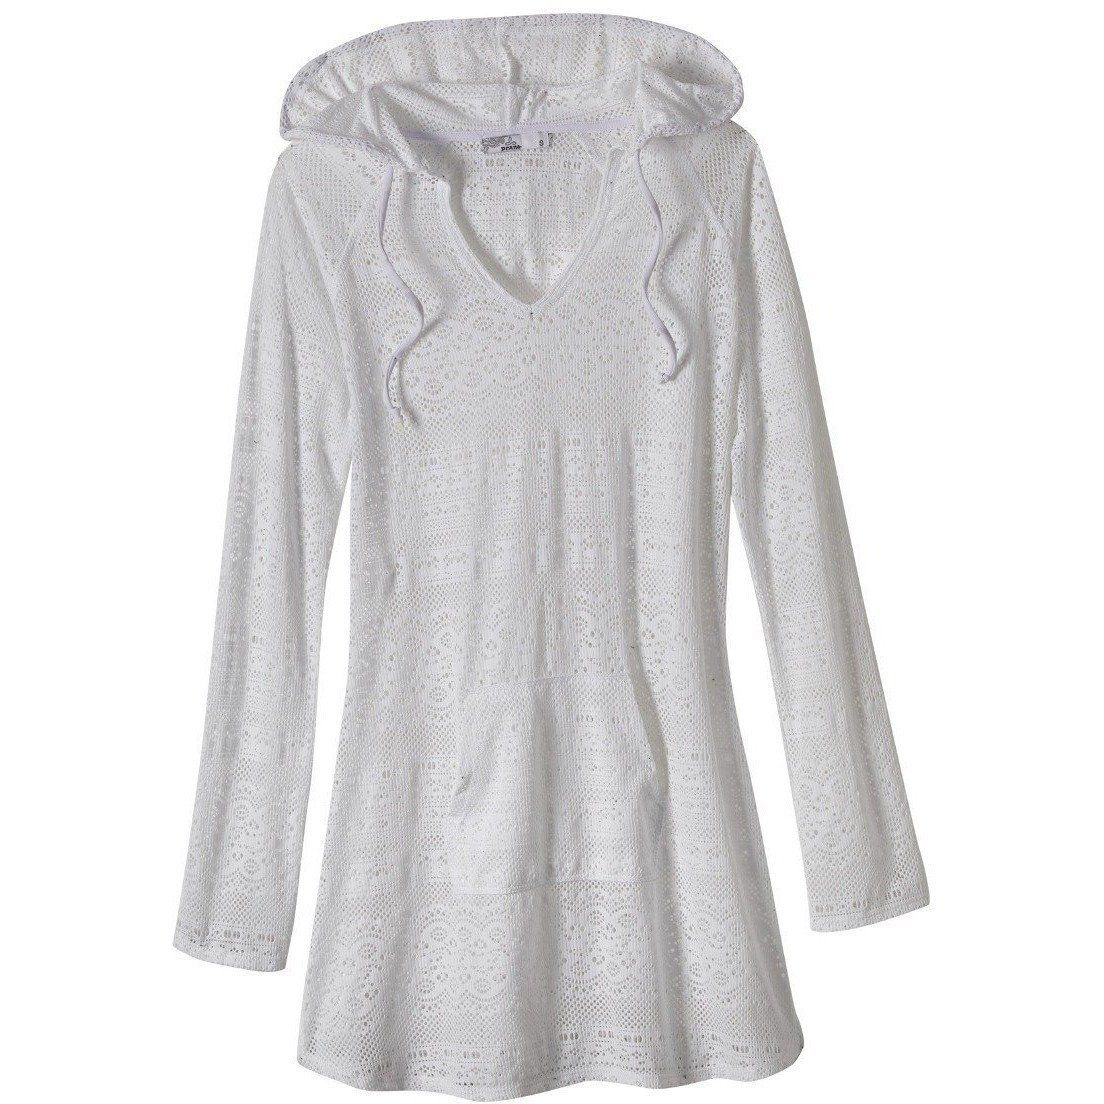 7fe699561e Prana Women's Luiza Tunic | Products | Tunic, White long sleeve ...